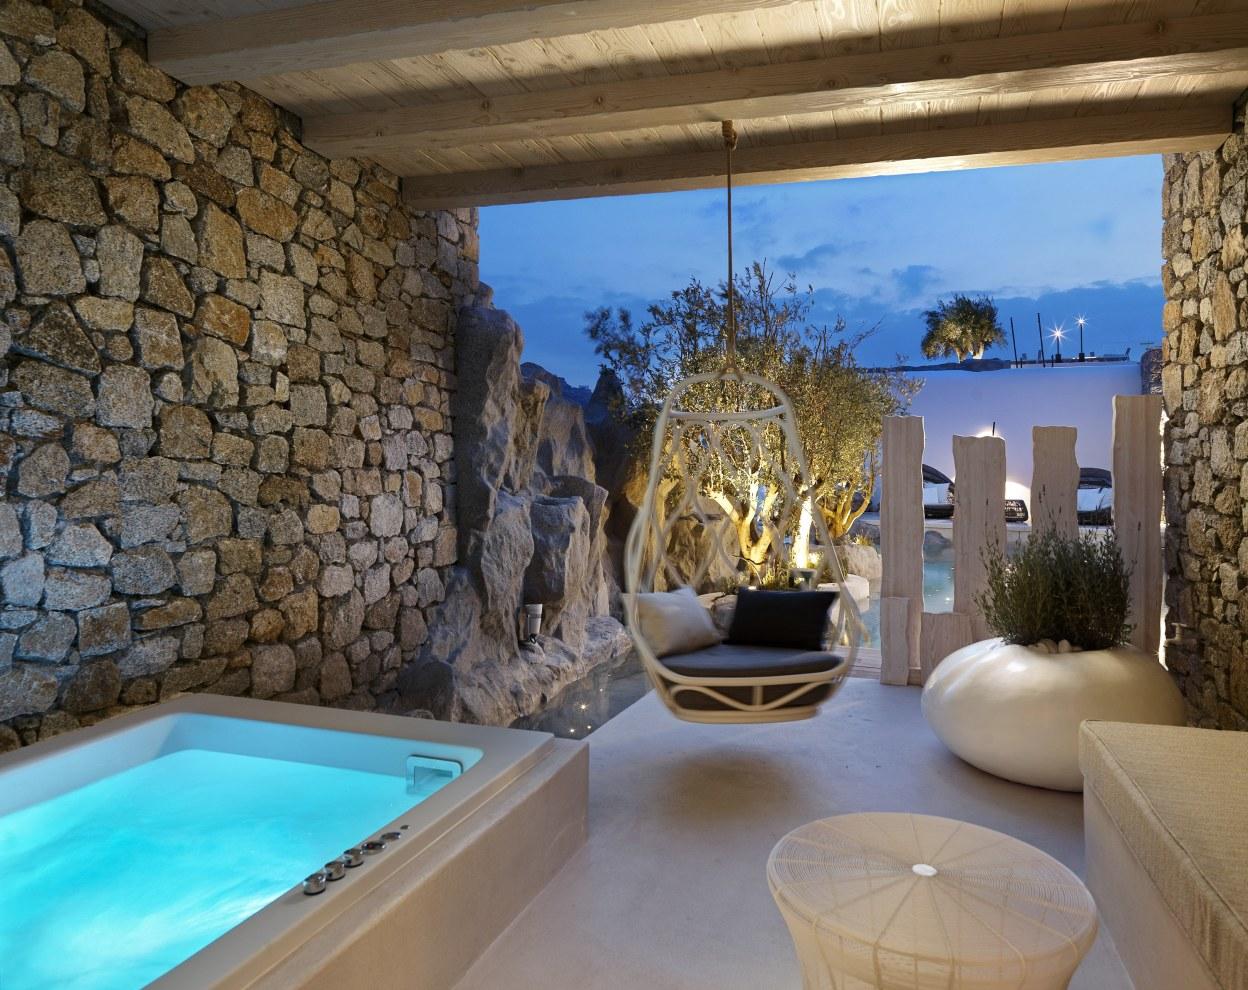 Kensho Mykonos Luxury Boutique Hotel Suites Luxury